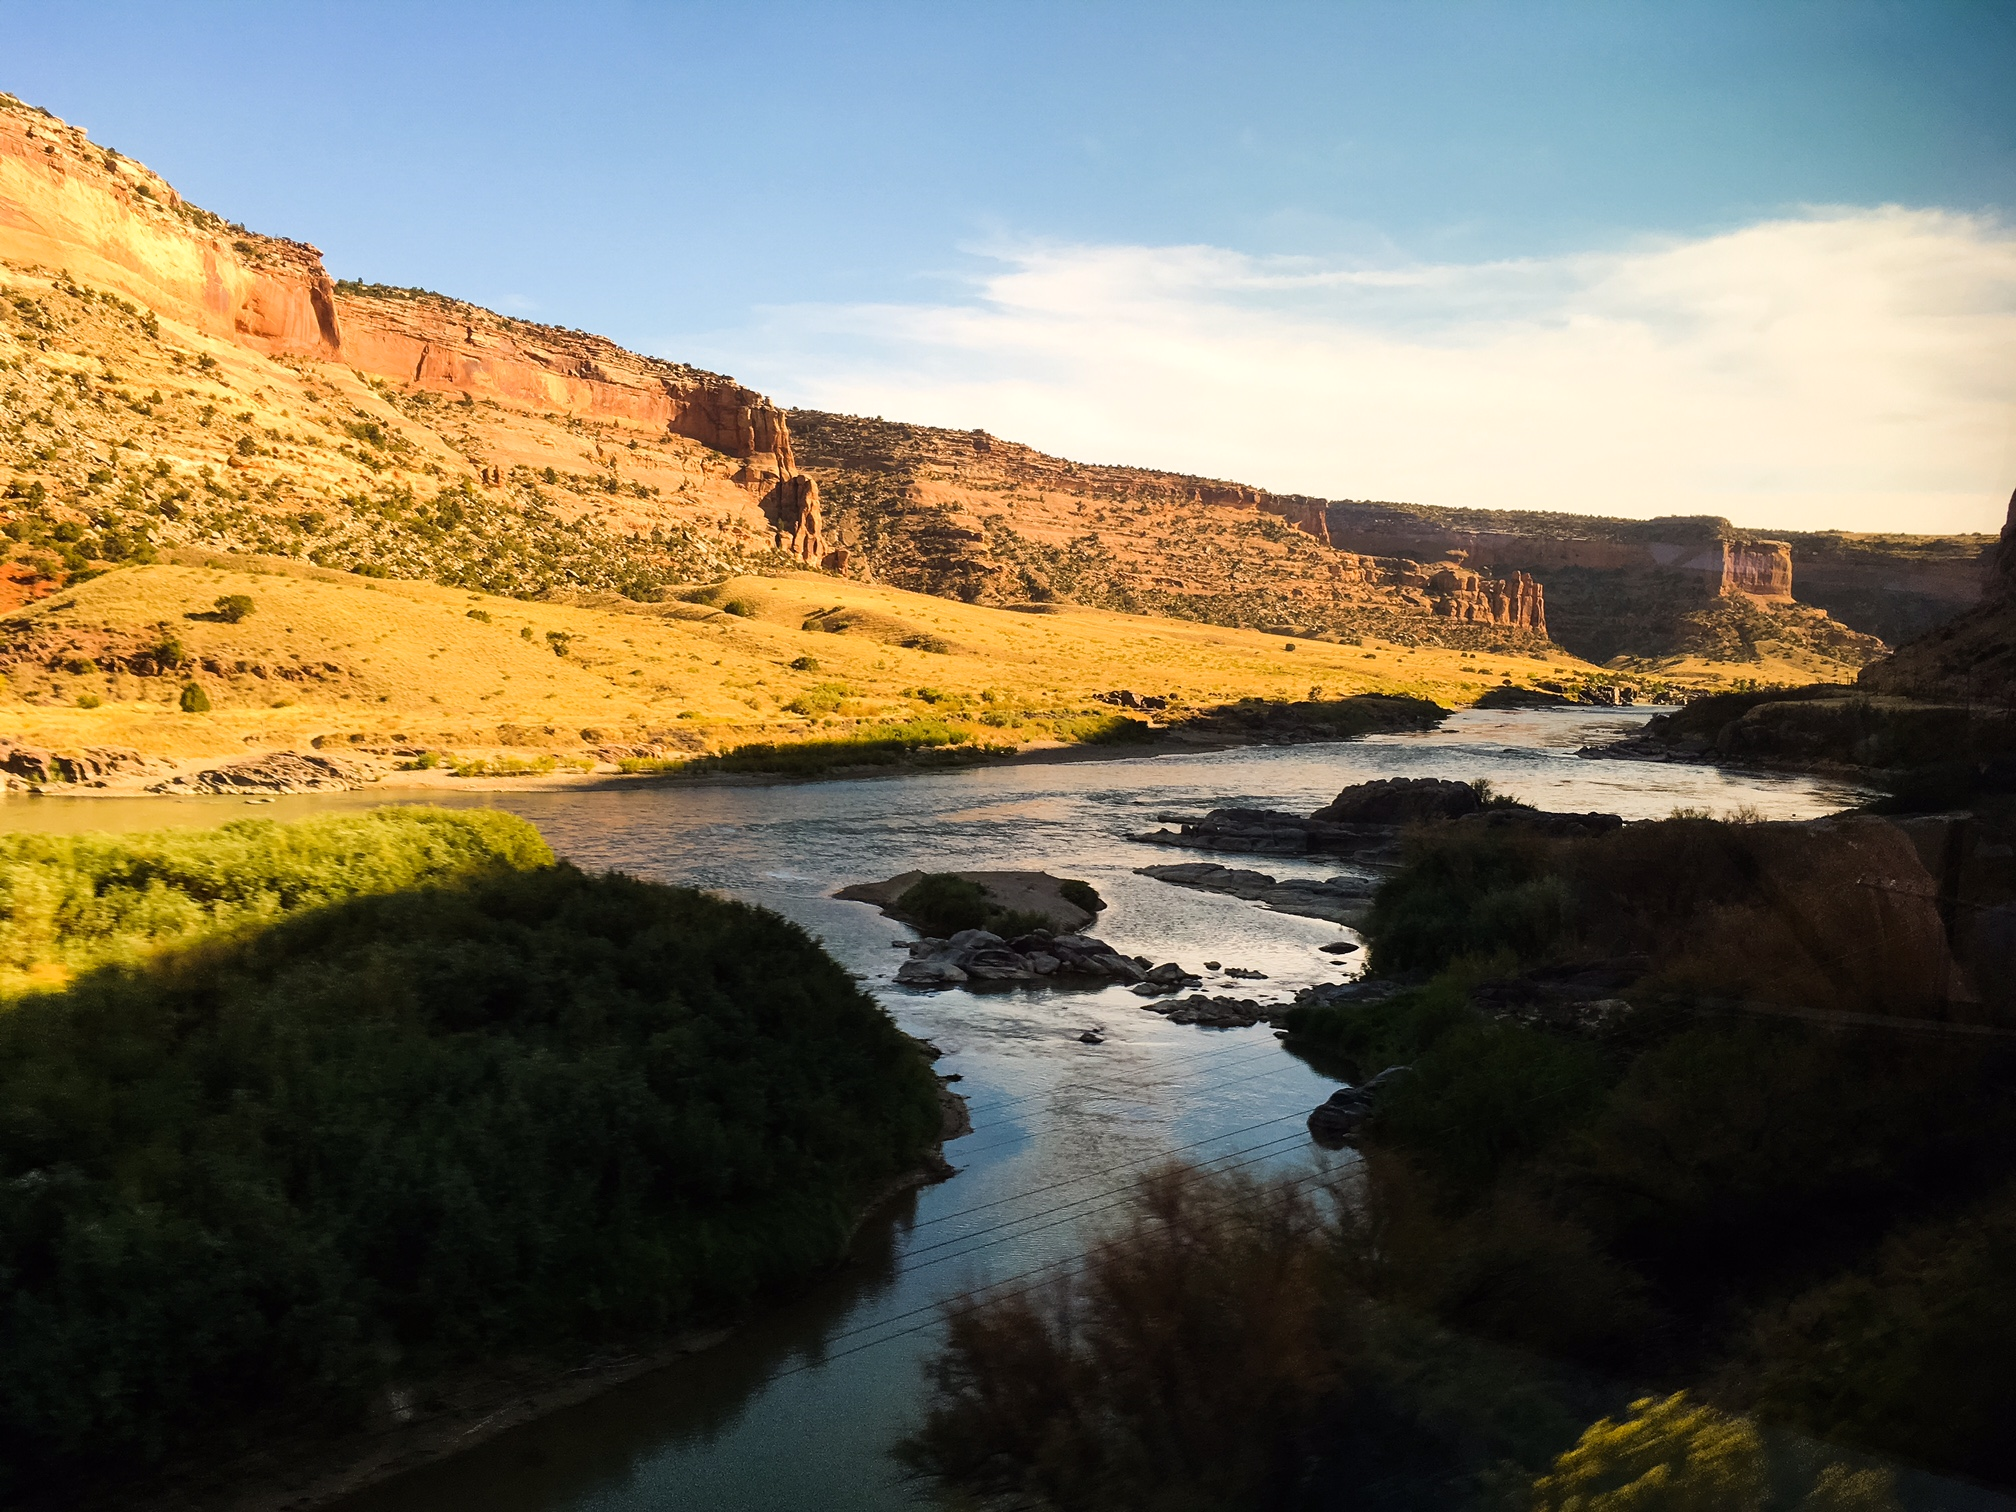 Ruby Canyon and the Colorado River west of Fruita, Colorado. © Bobby Magill